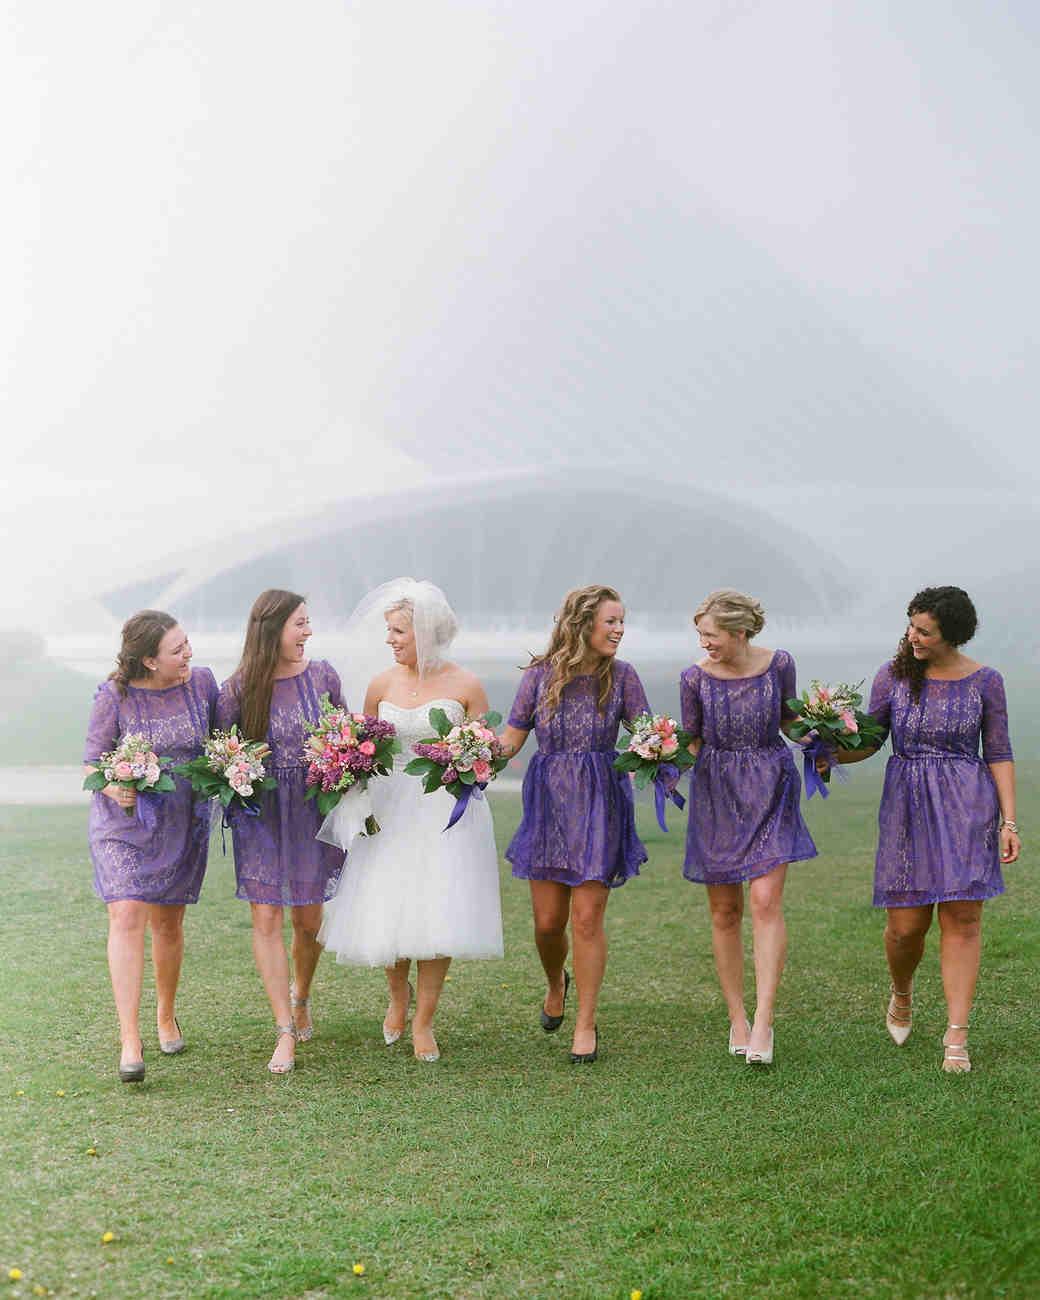 libby-allen-wedding-bridesmaids-060-s112487-0116.jpg